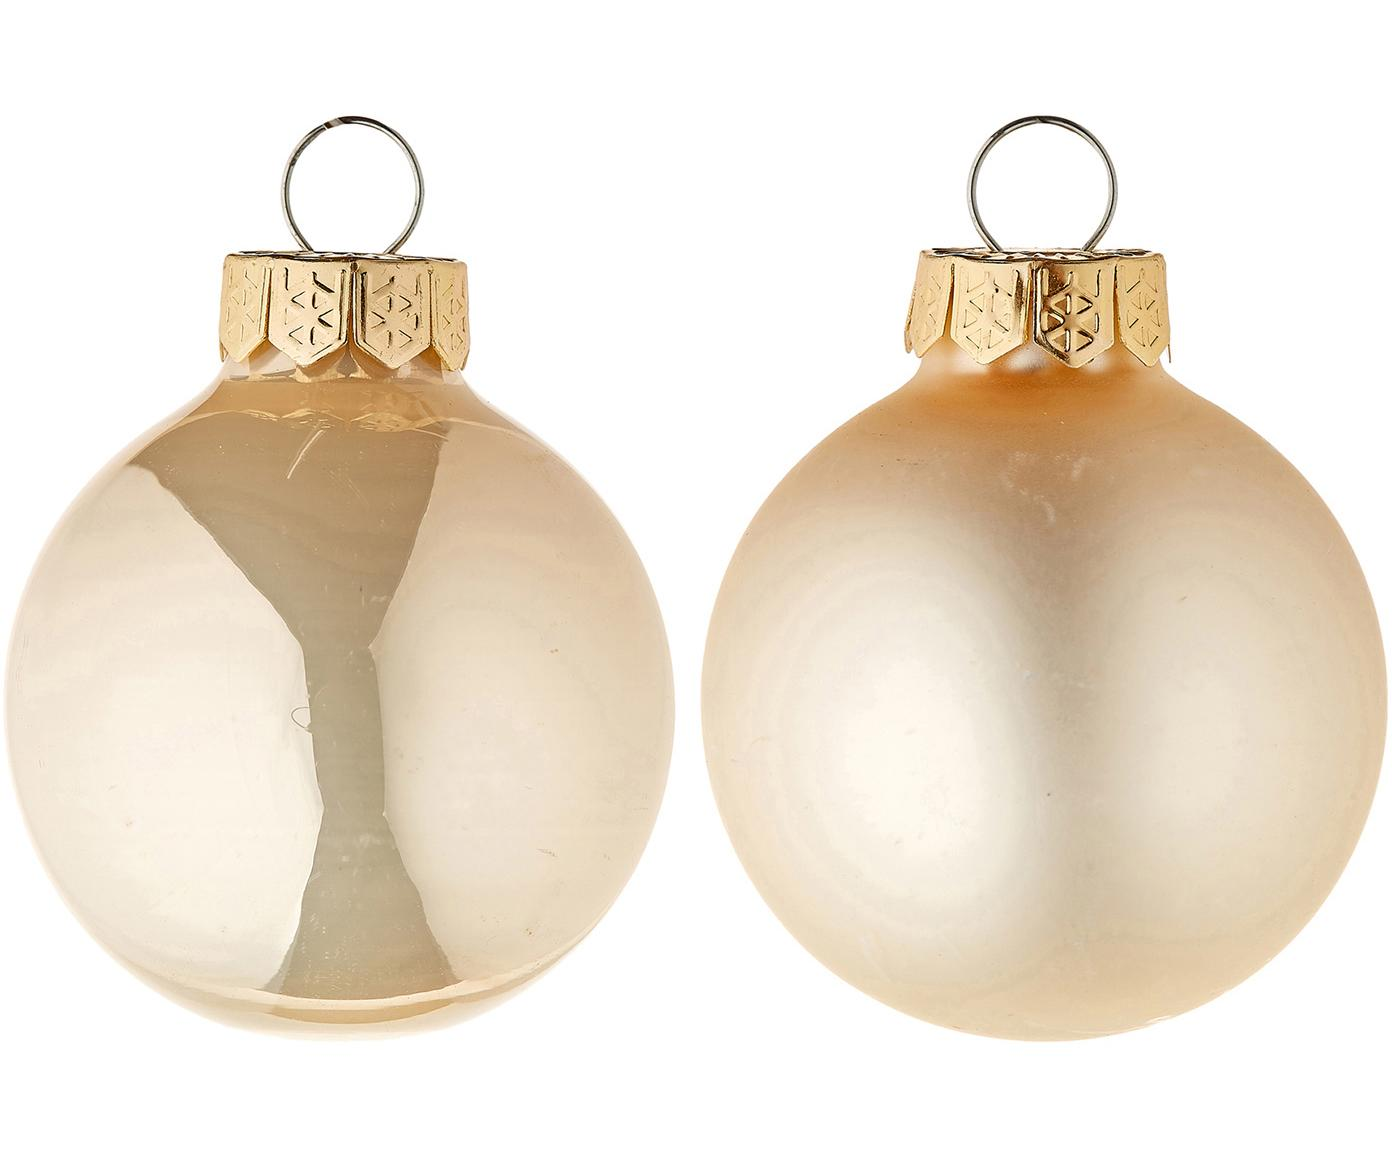 Mini-Weihnachtskugel-Set EvergreenØ4cm, 16-tlg., Cremefarben, Ø 4 cm